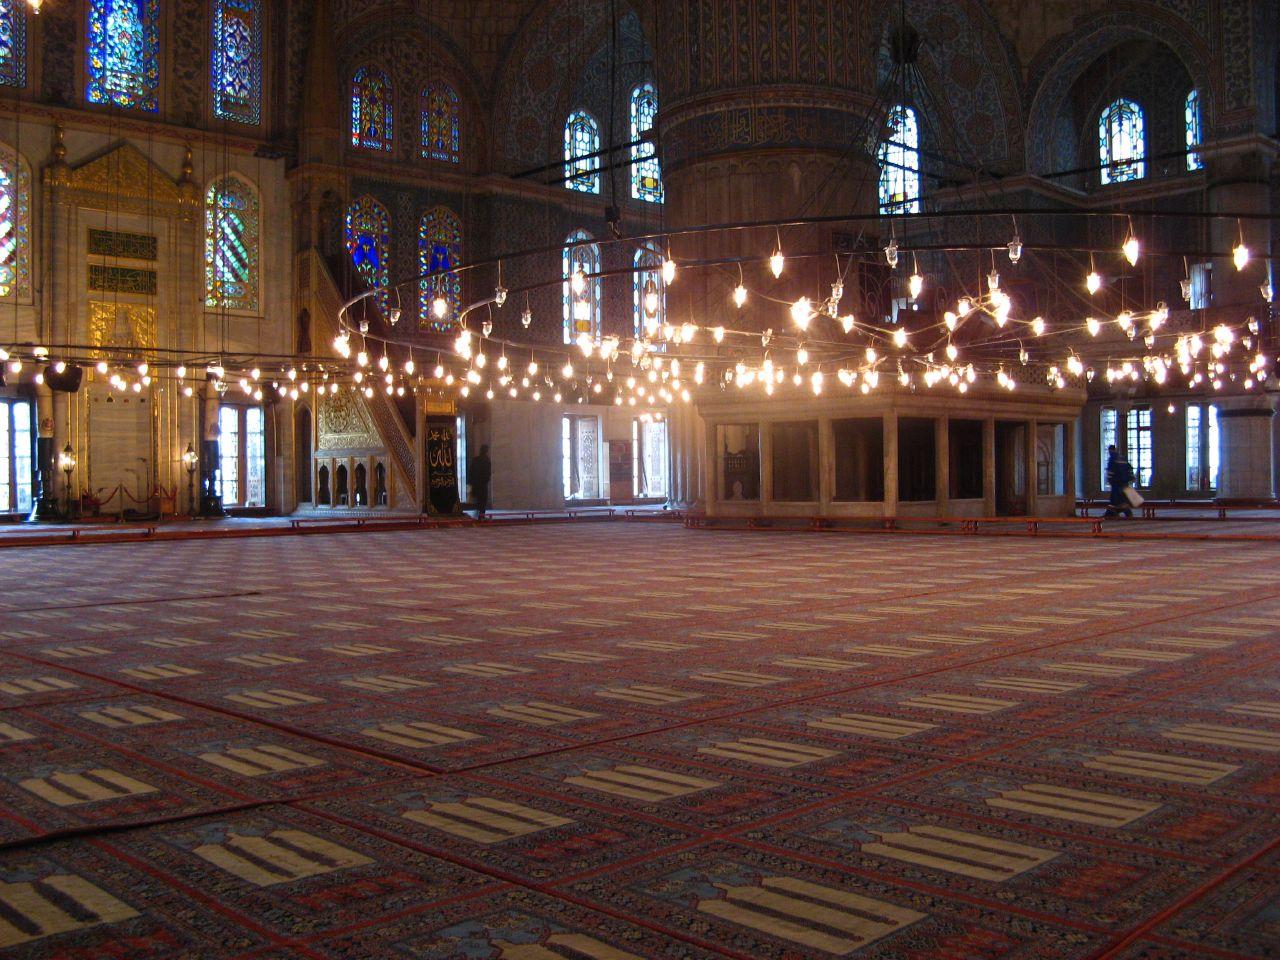 Mosque-Carpet3.jpg